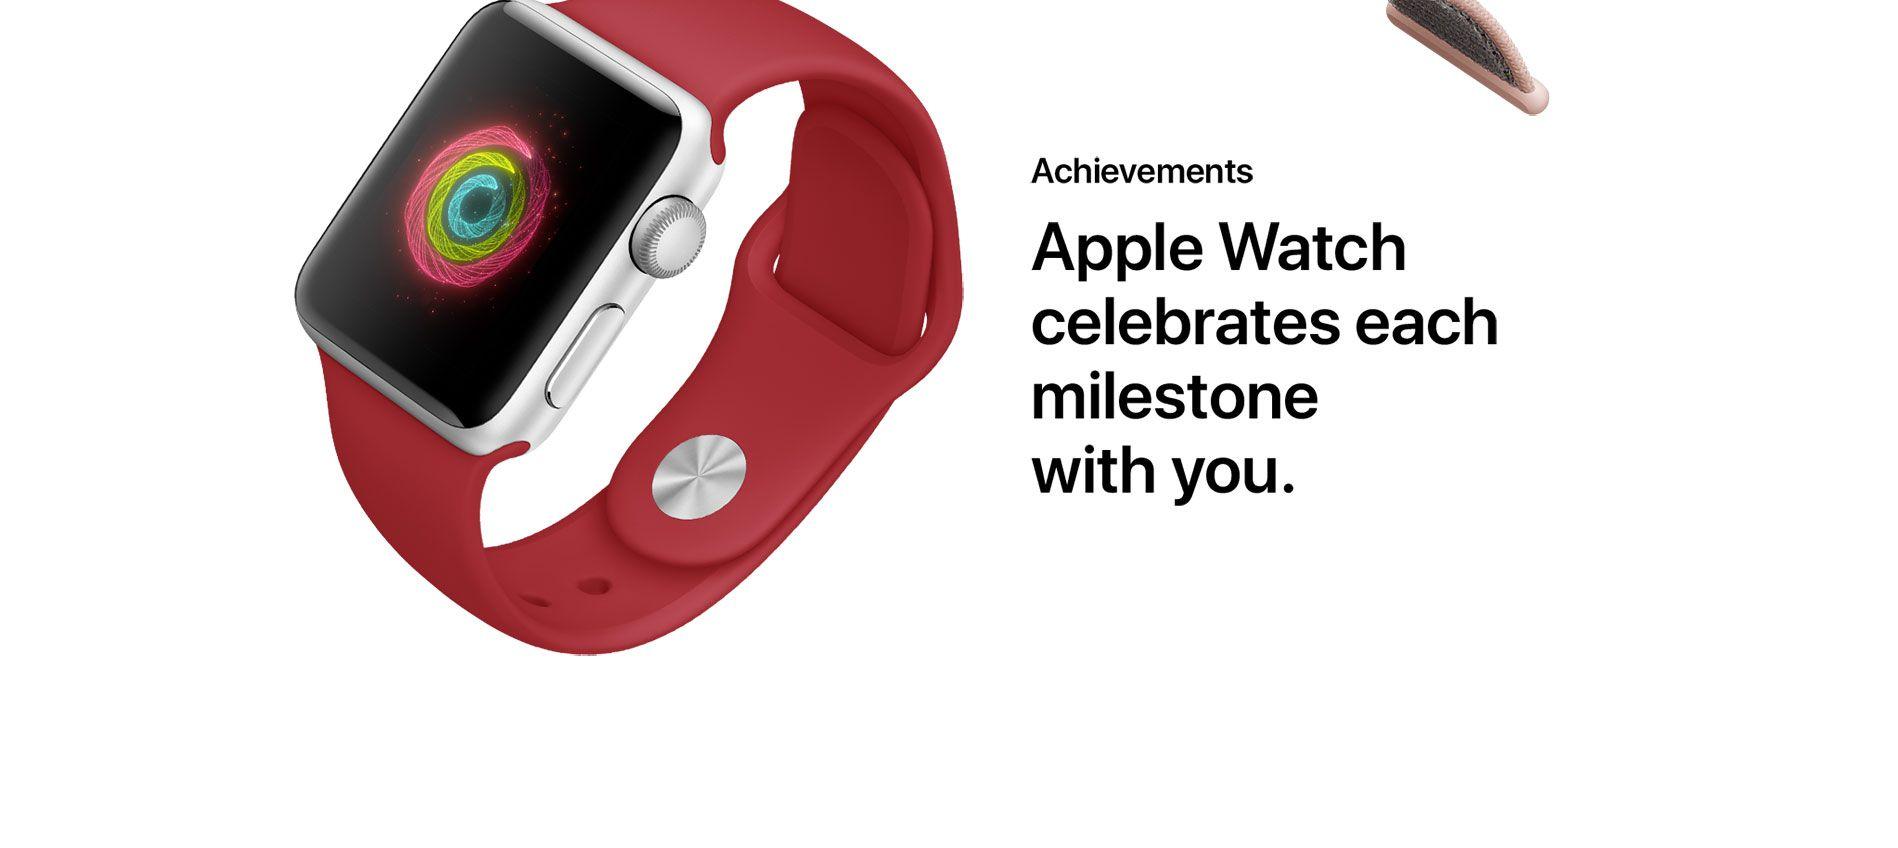 Achievements - Apple Watch celebrates each milestone with you